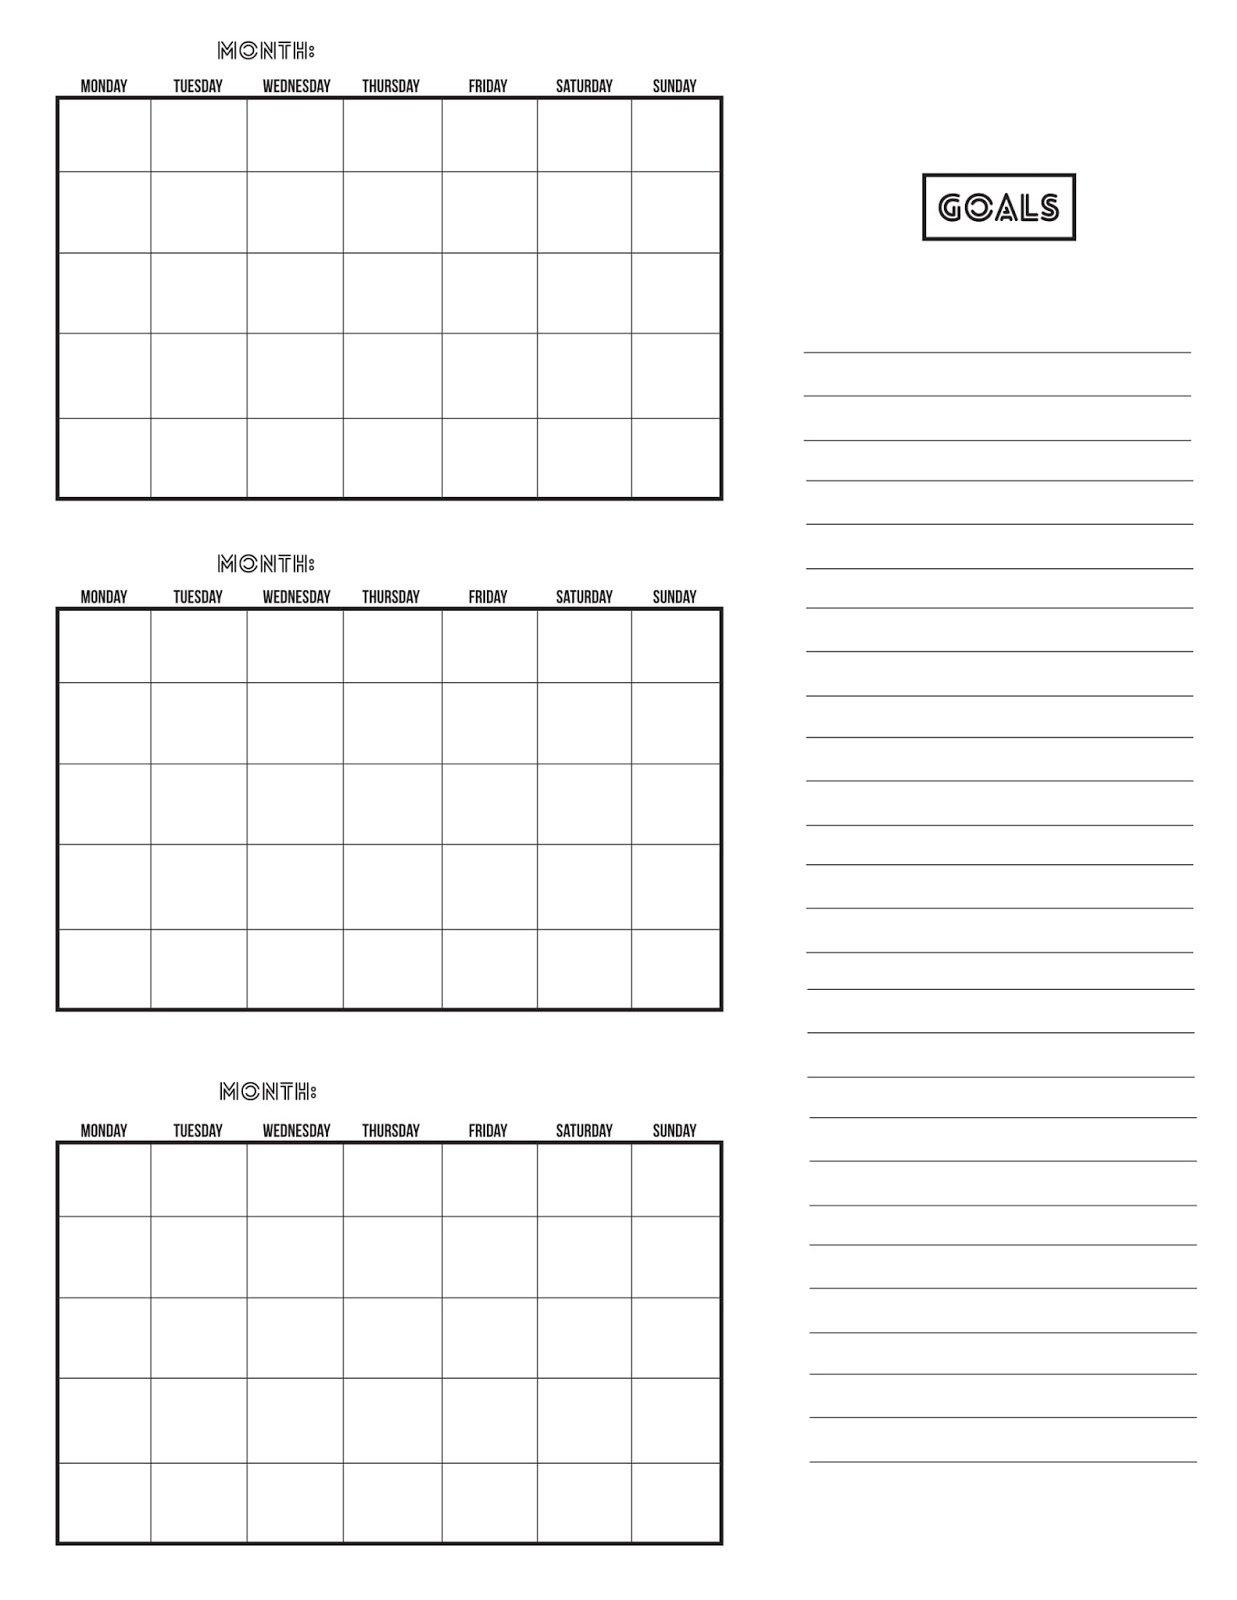 The Obsessive Imagist | Art, Design, Life: Getting 3 Month Free Calendar